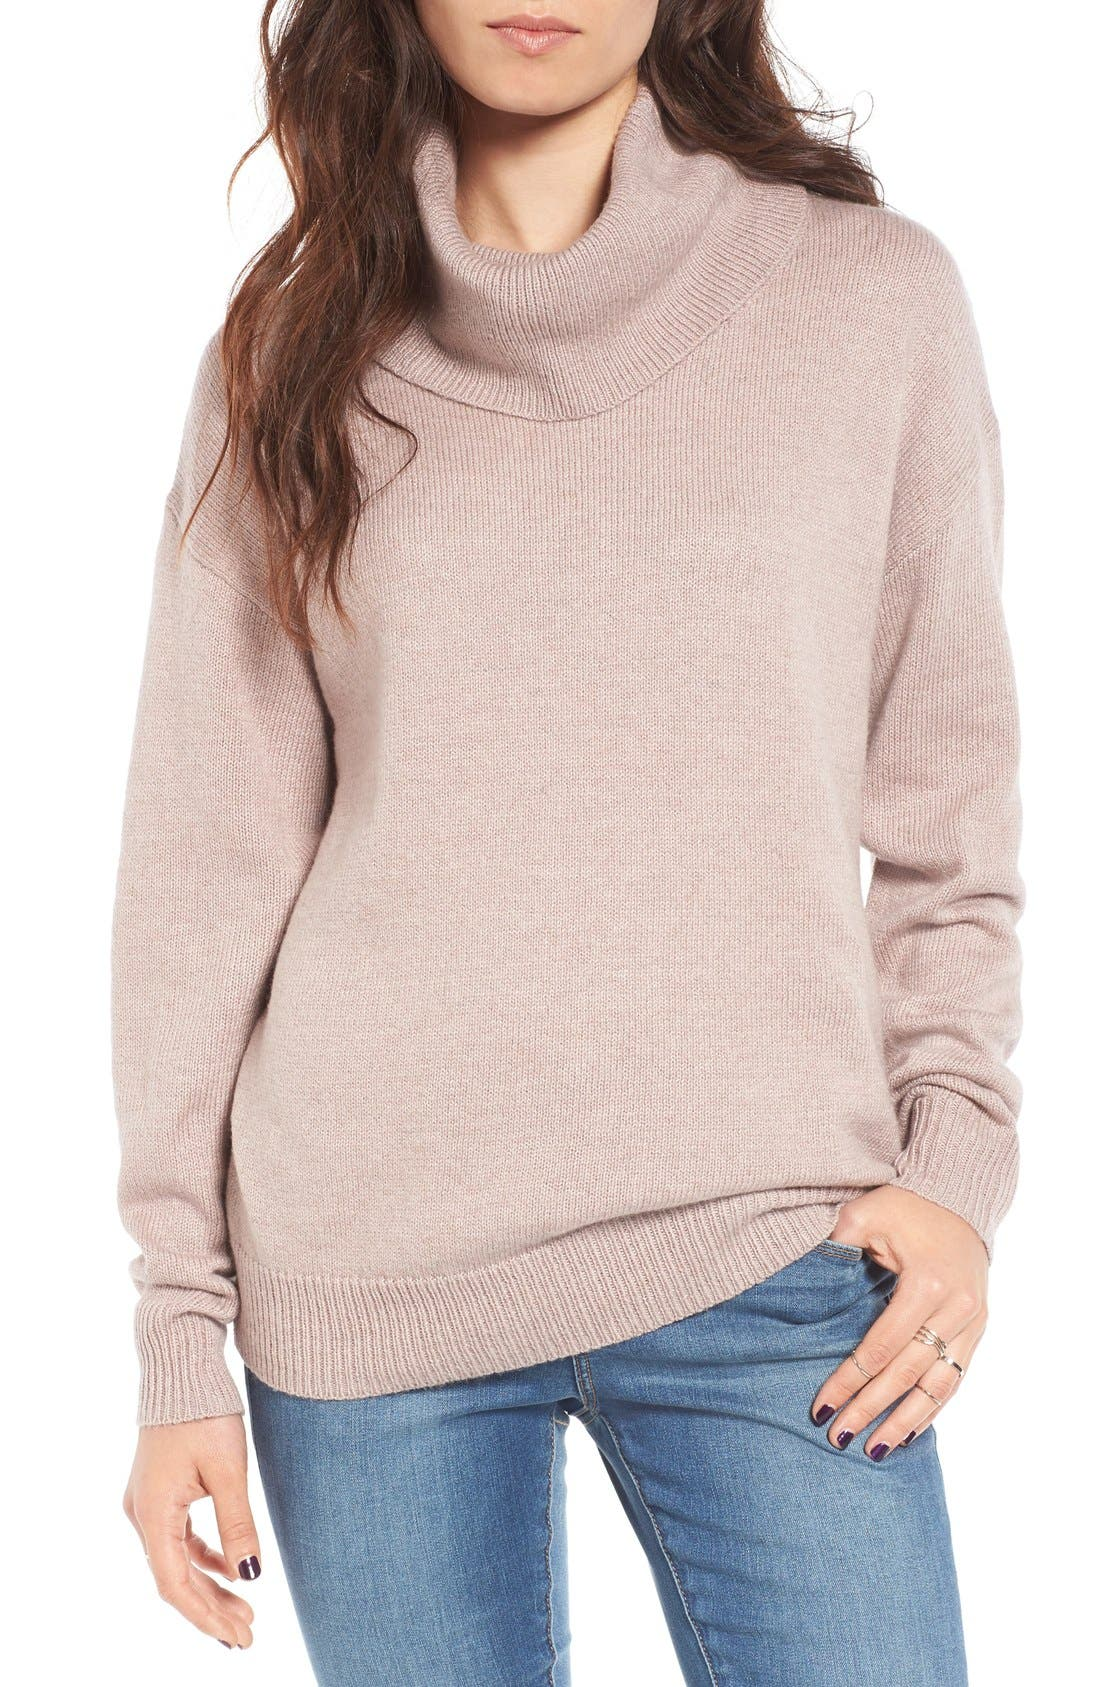 Alternate Image 1 Selected - BP. Turtleneck Sweater